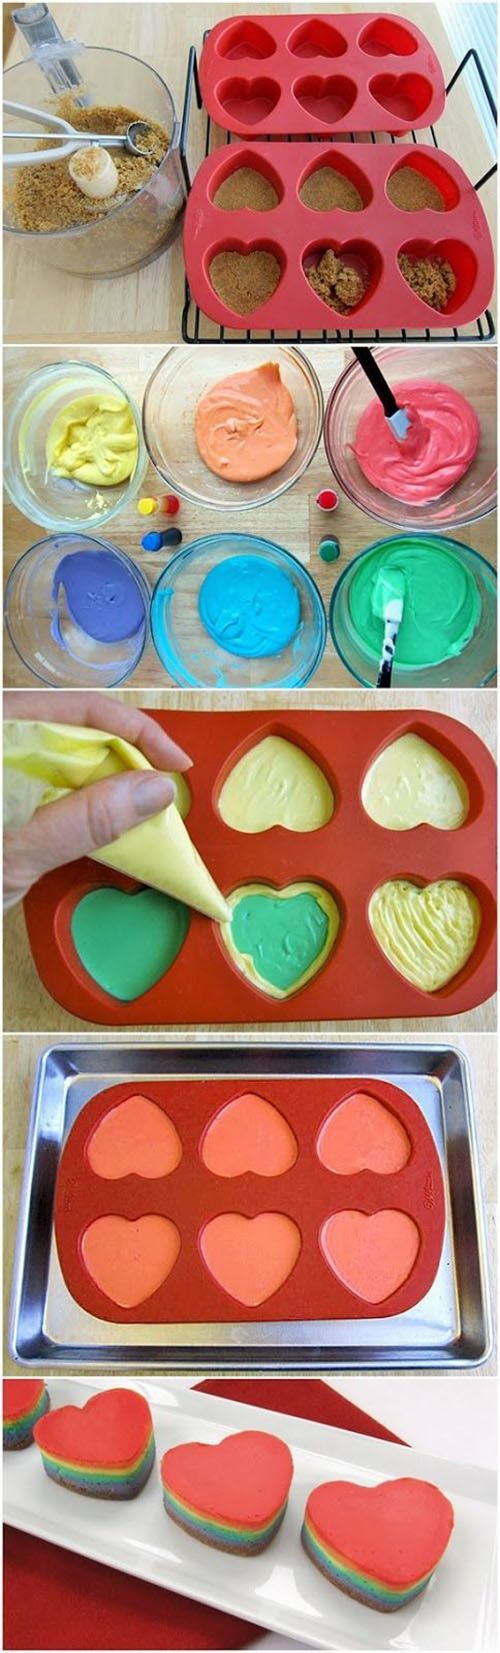 Diy Mini Rainbow Cheesecakes | DIY & Crafts Tutorials